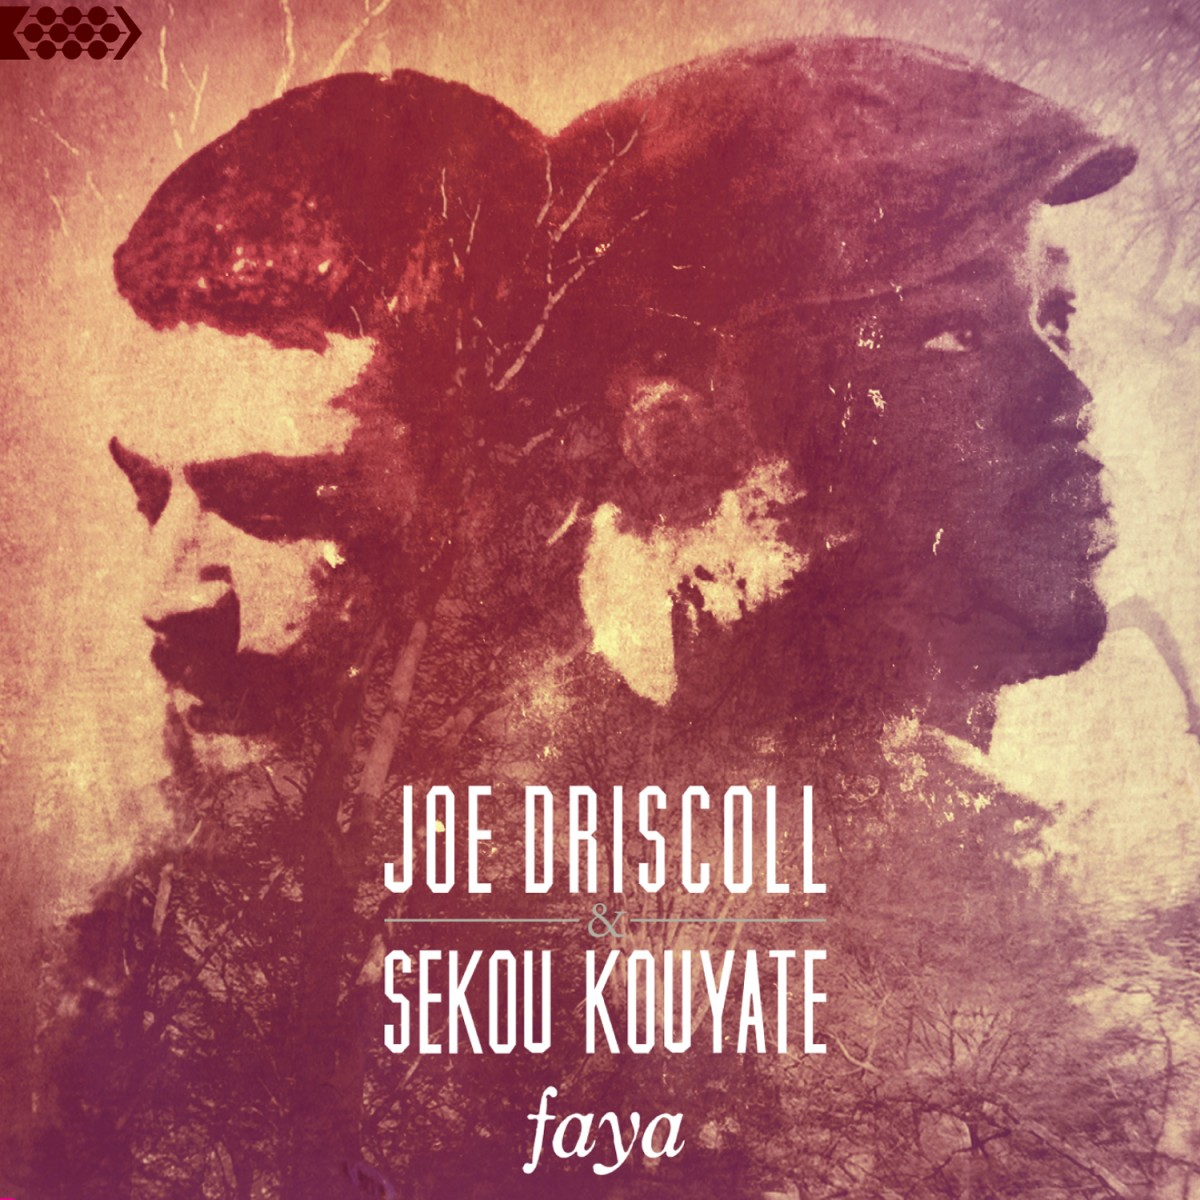 Driscoll, Joe & Kouyate, Sekou: Faya (2013)